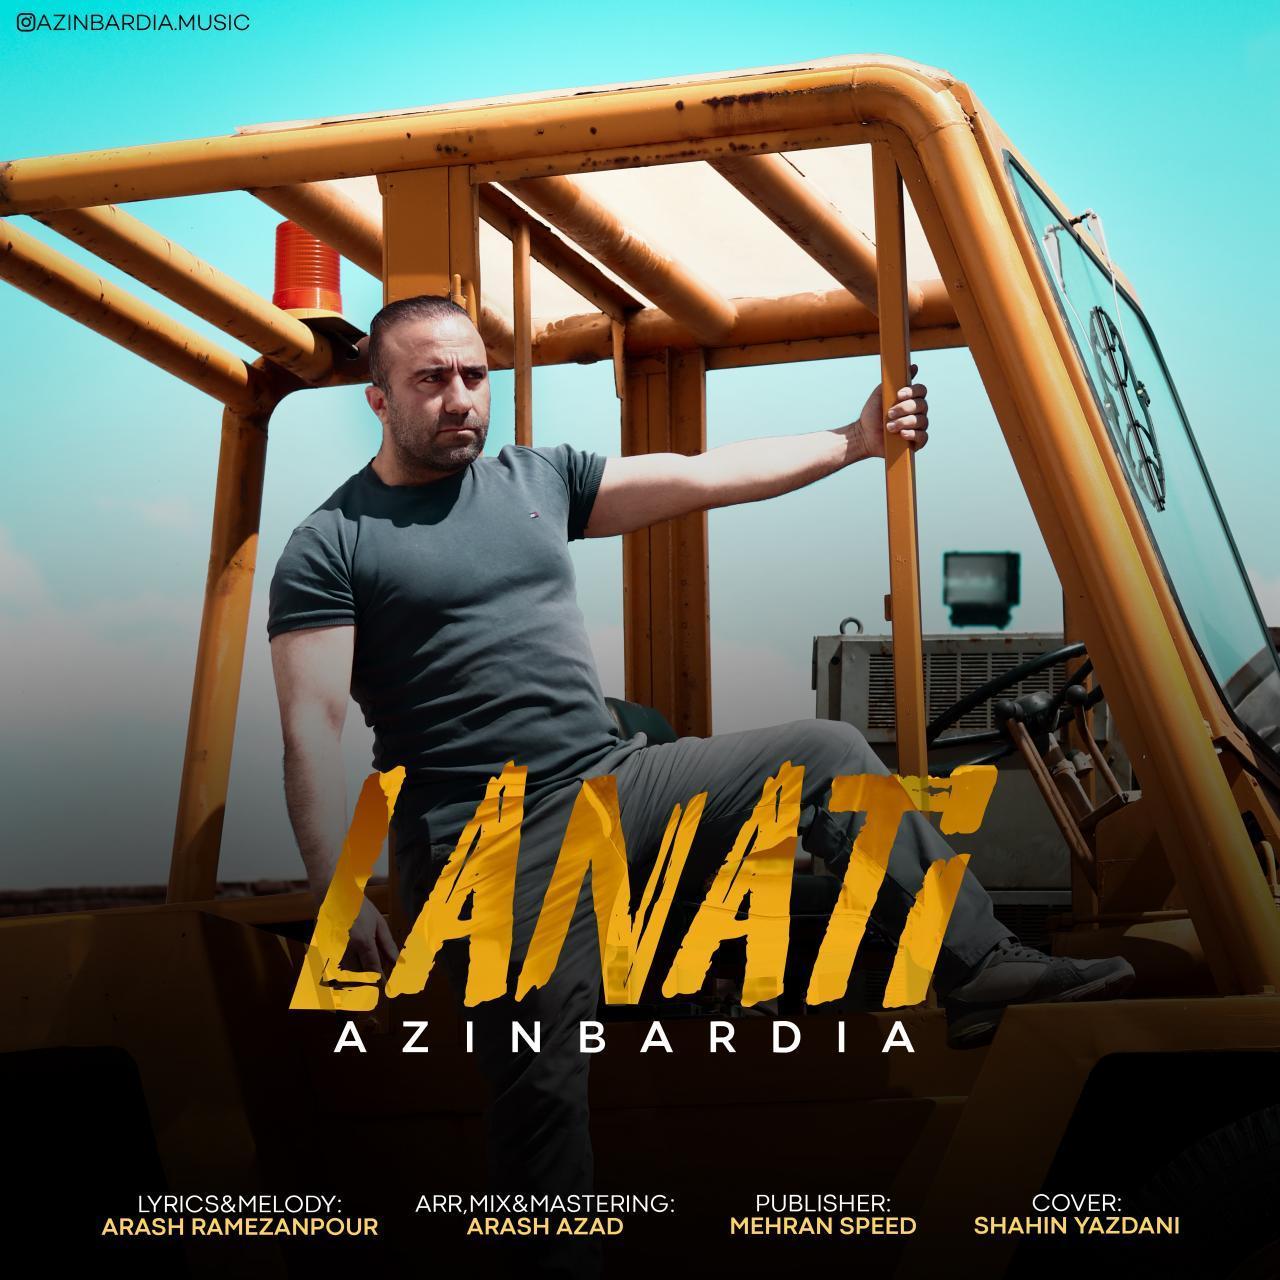 Azin Bardia – Lanati